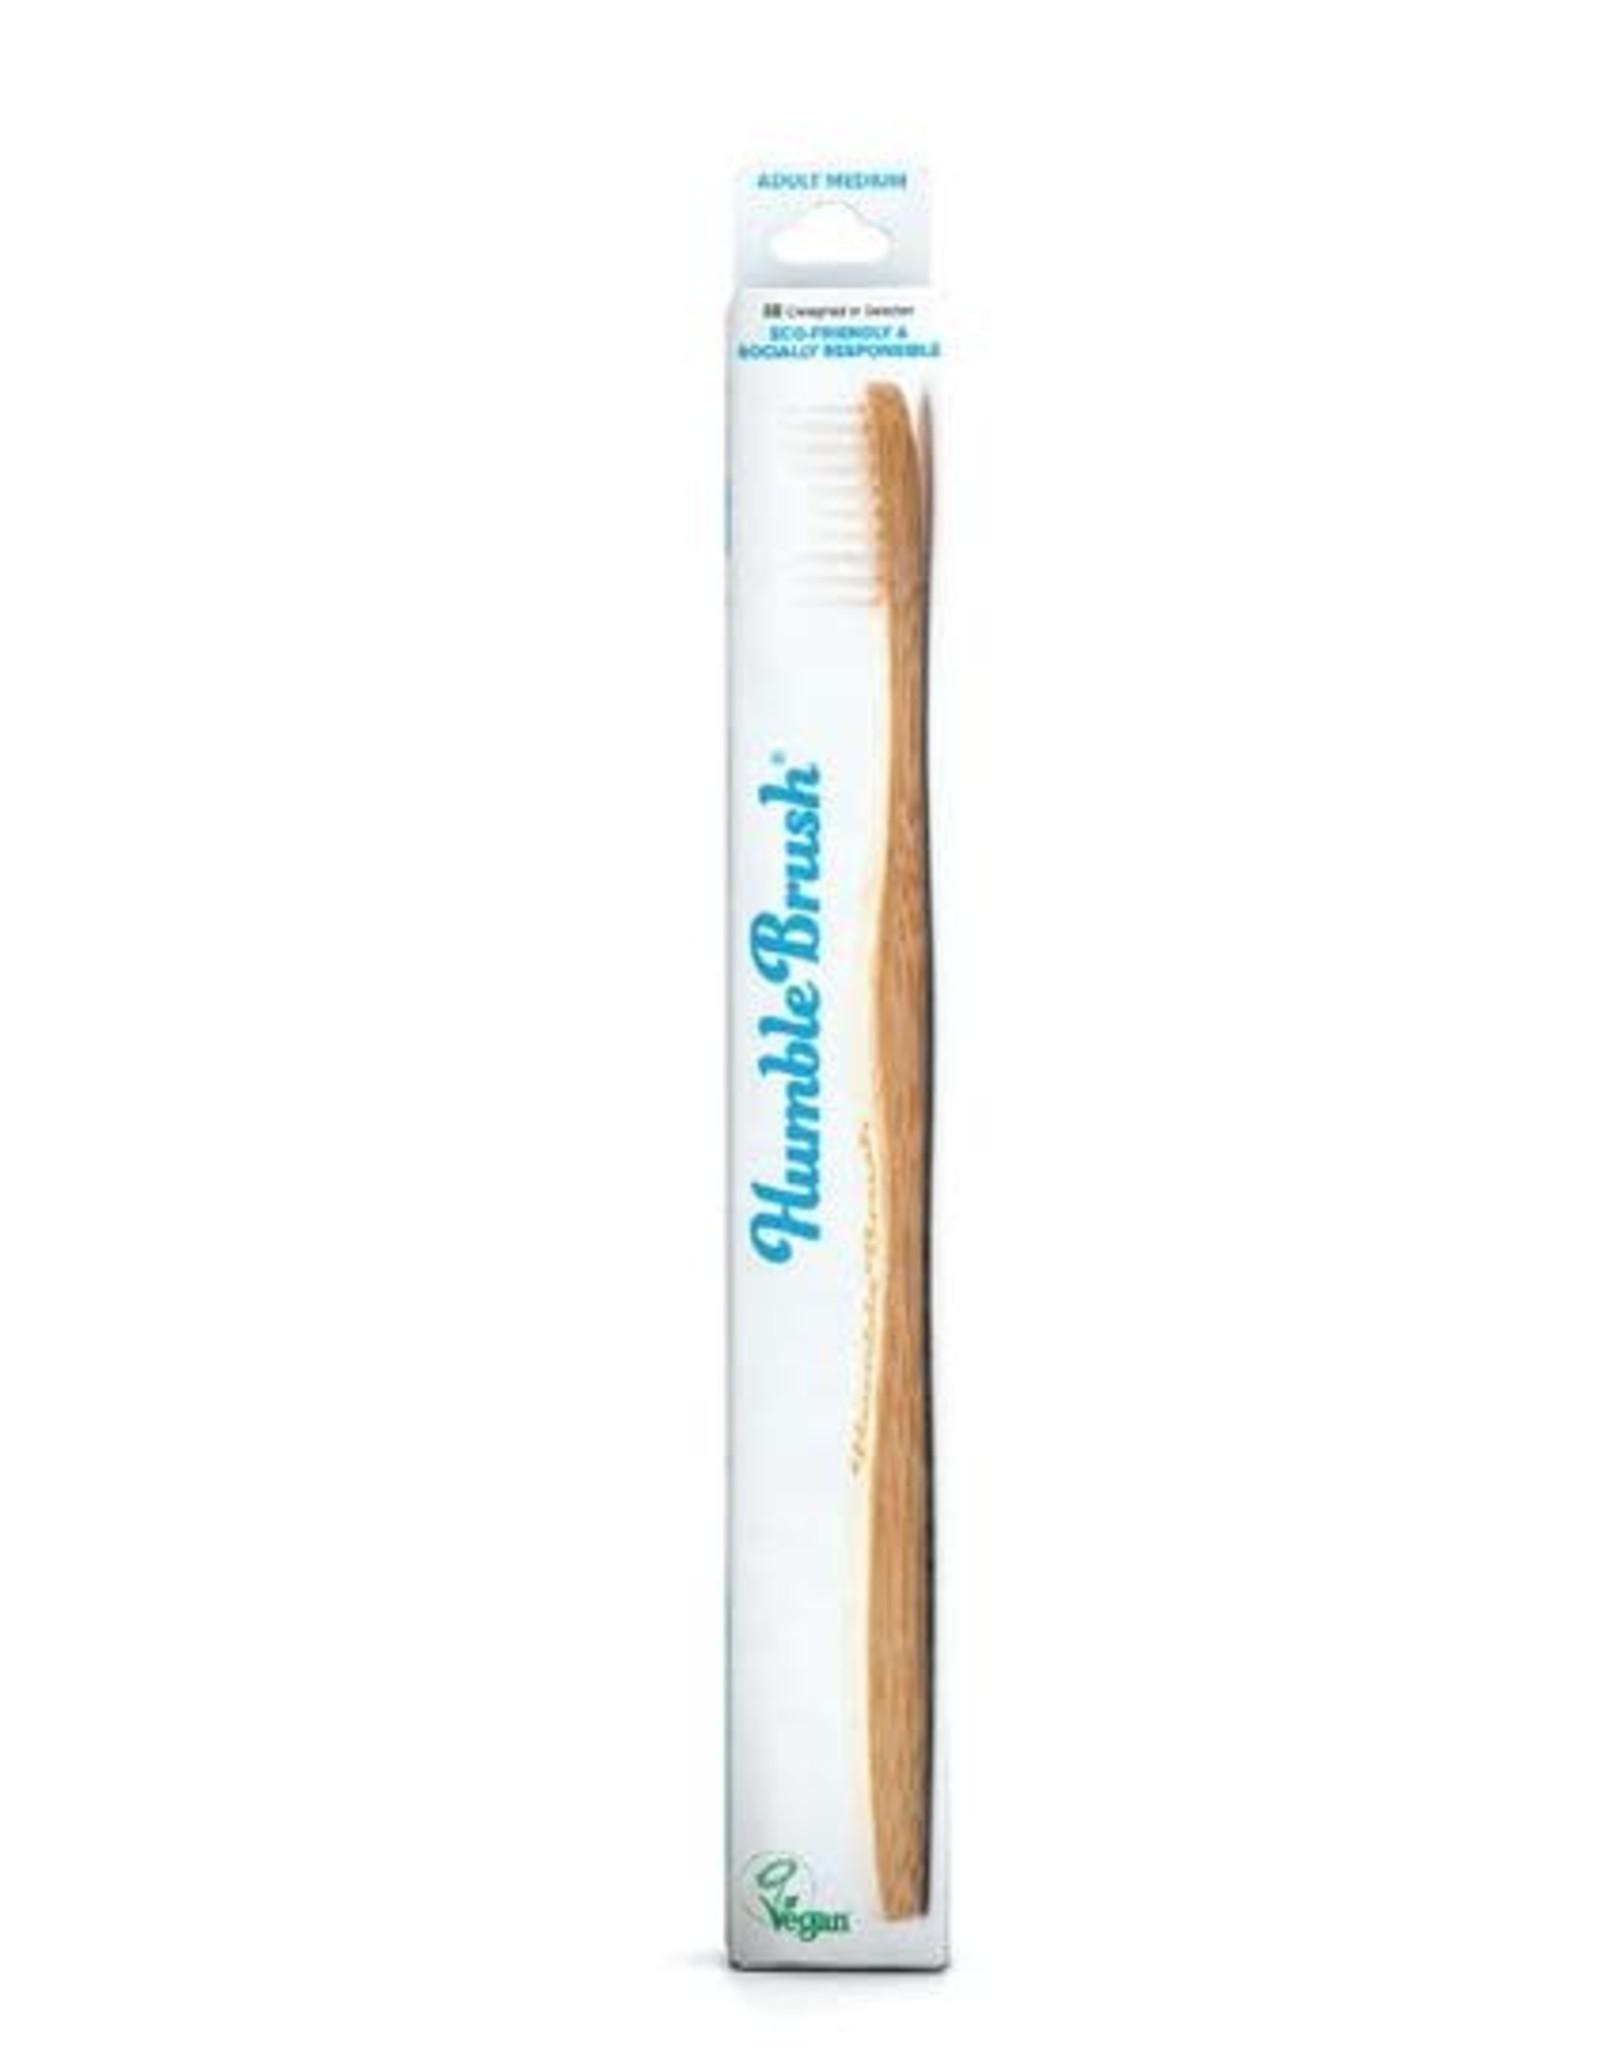 The Humble Co. Humble Brush Toothbrush White Medium